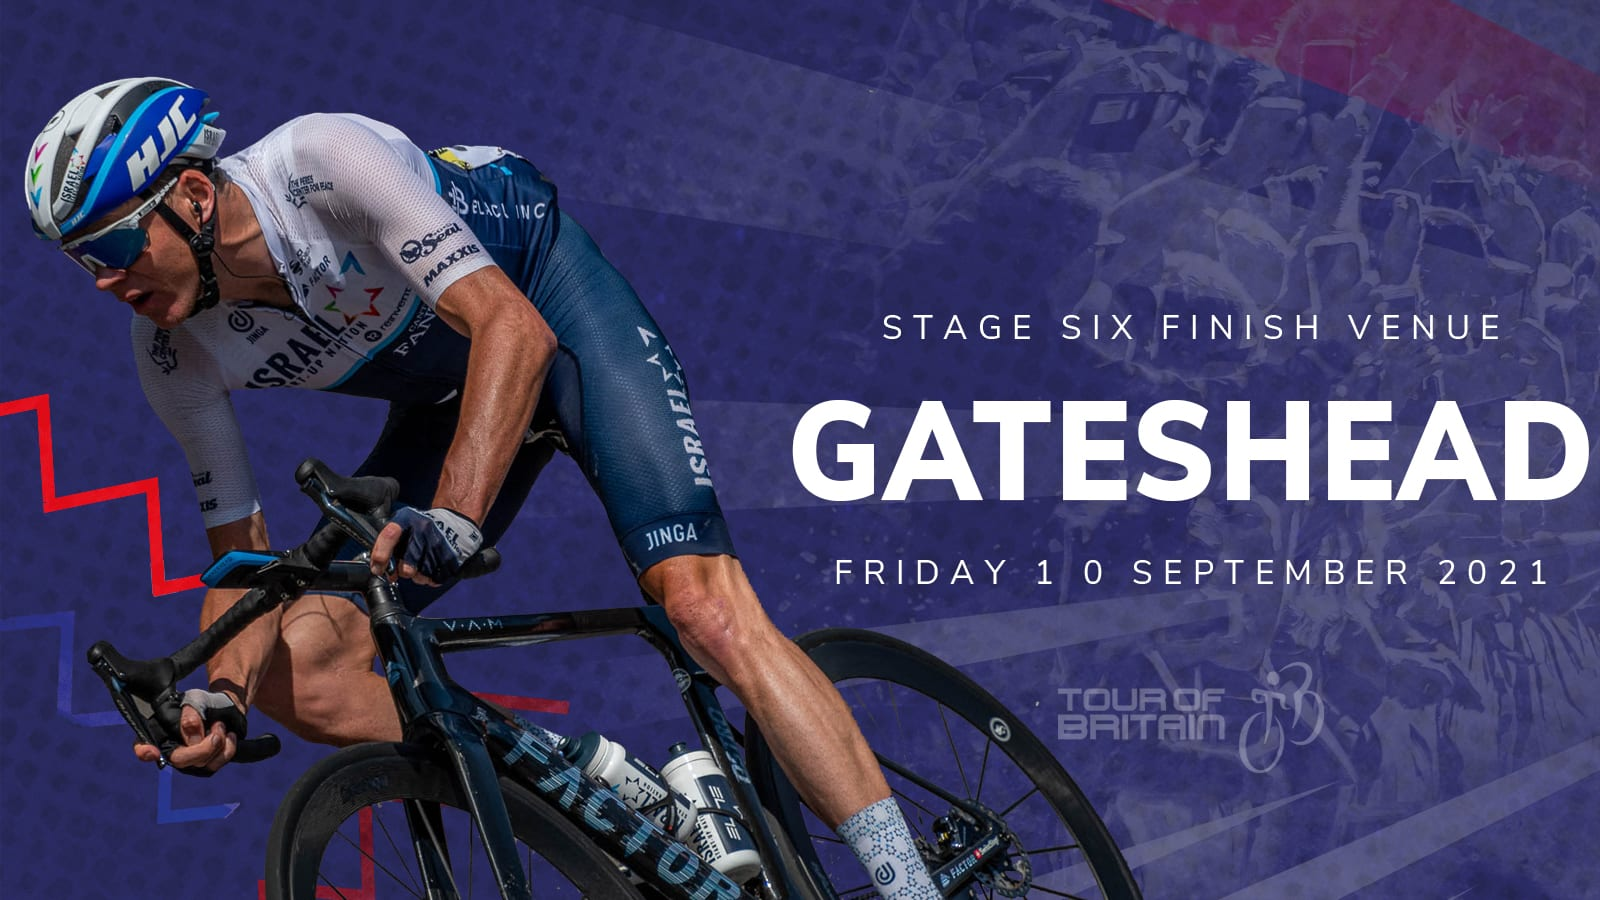 Tour of Britain Gateshead